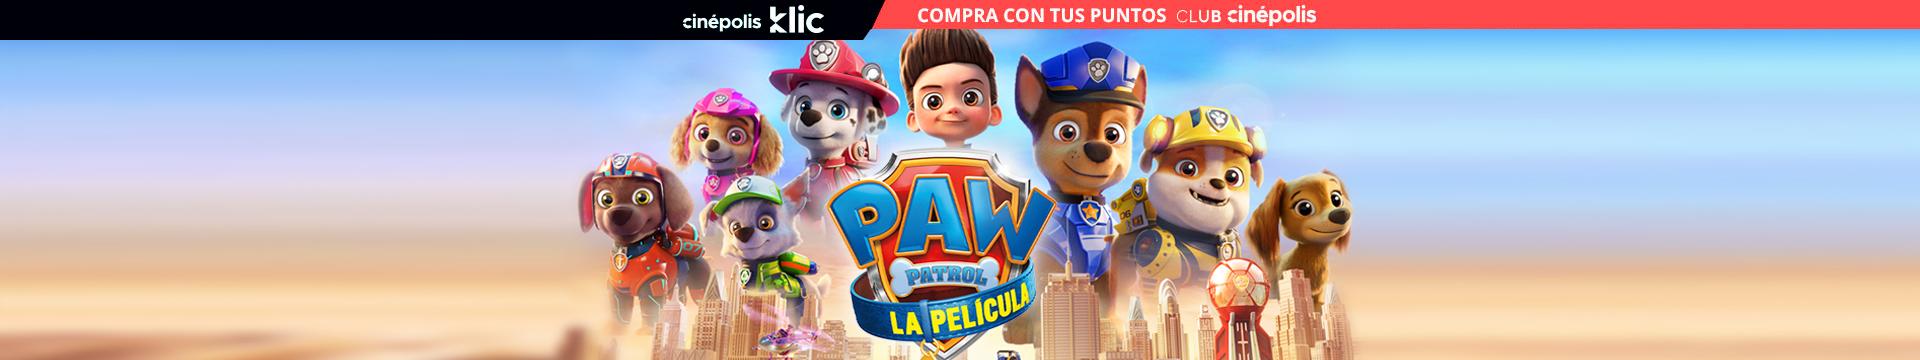 Klic Paw Patrol La Pelicula